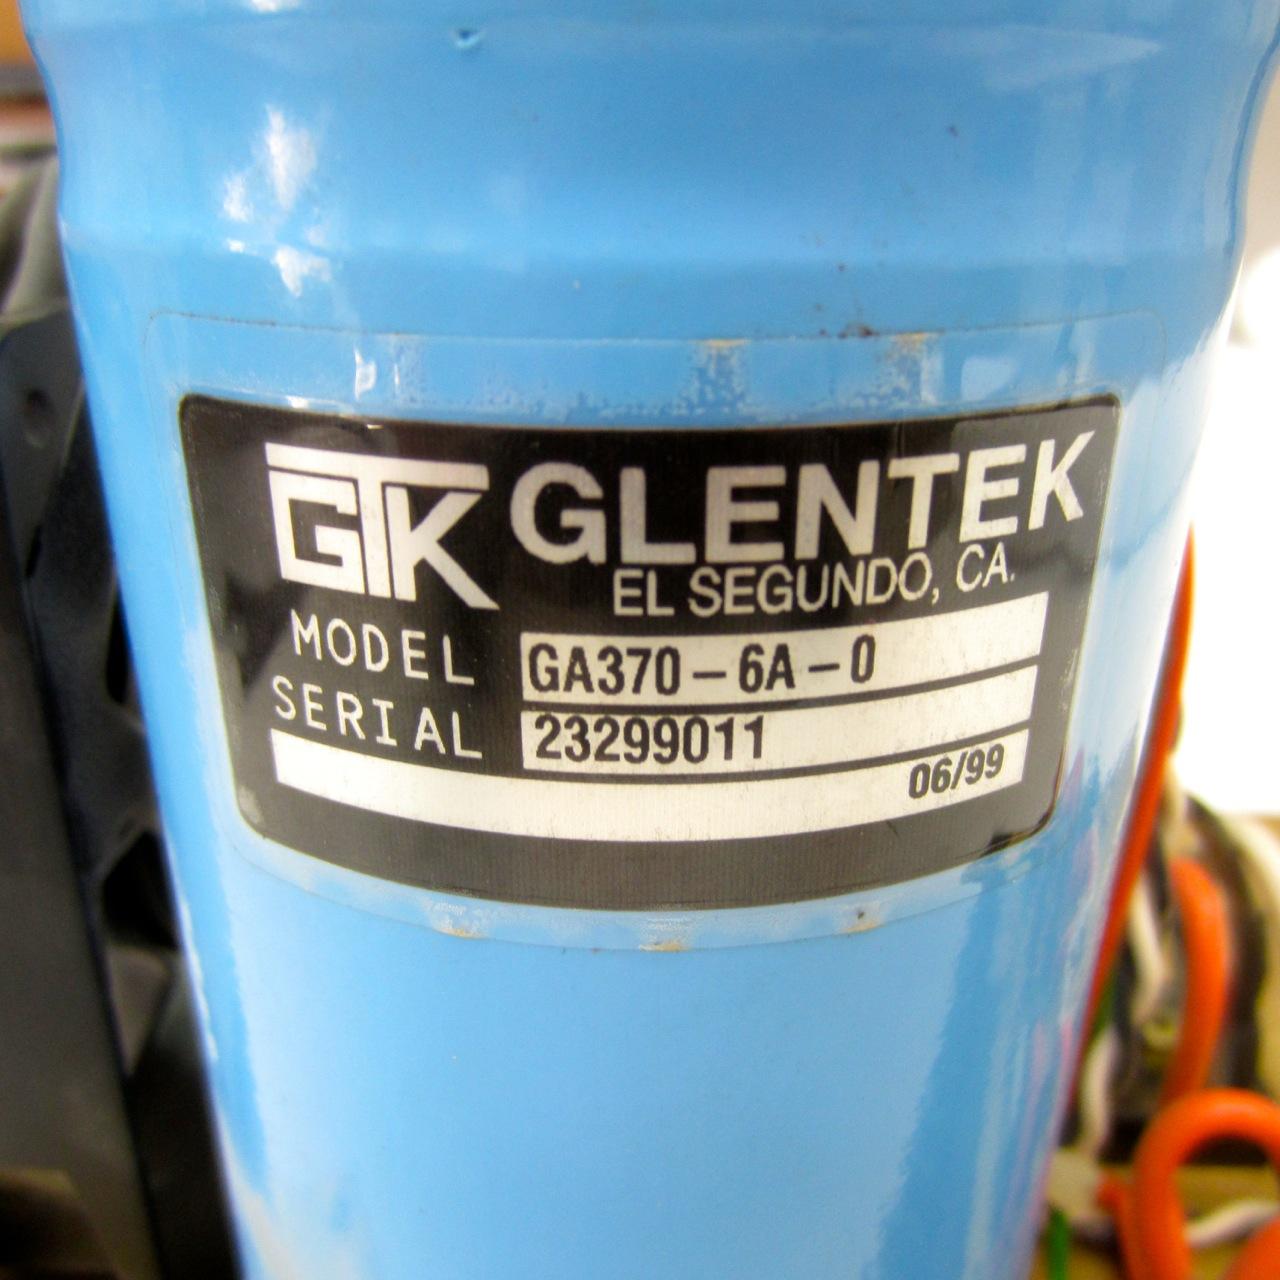 Glentek-GA370-1A-0